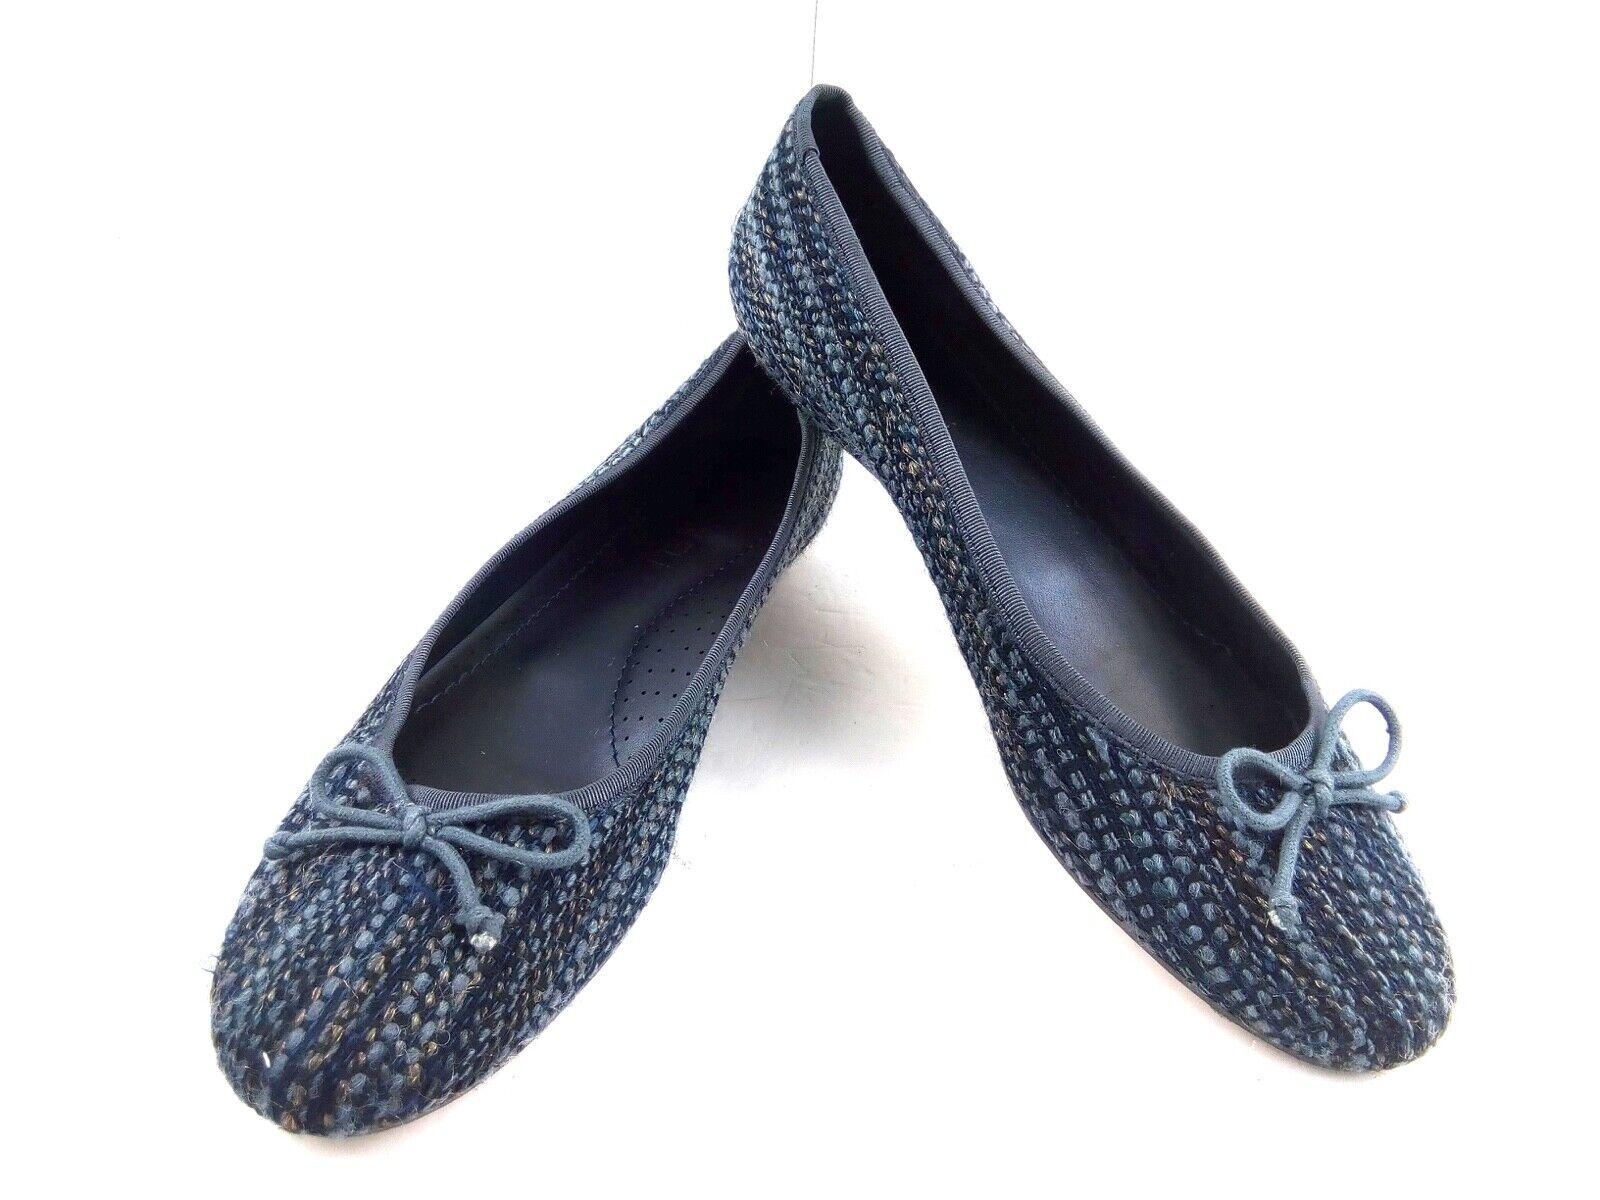 Vaneli Women's 9.5M bluee   Grey Bow Tweed Fabric slip-On Ballet Flats shoes